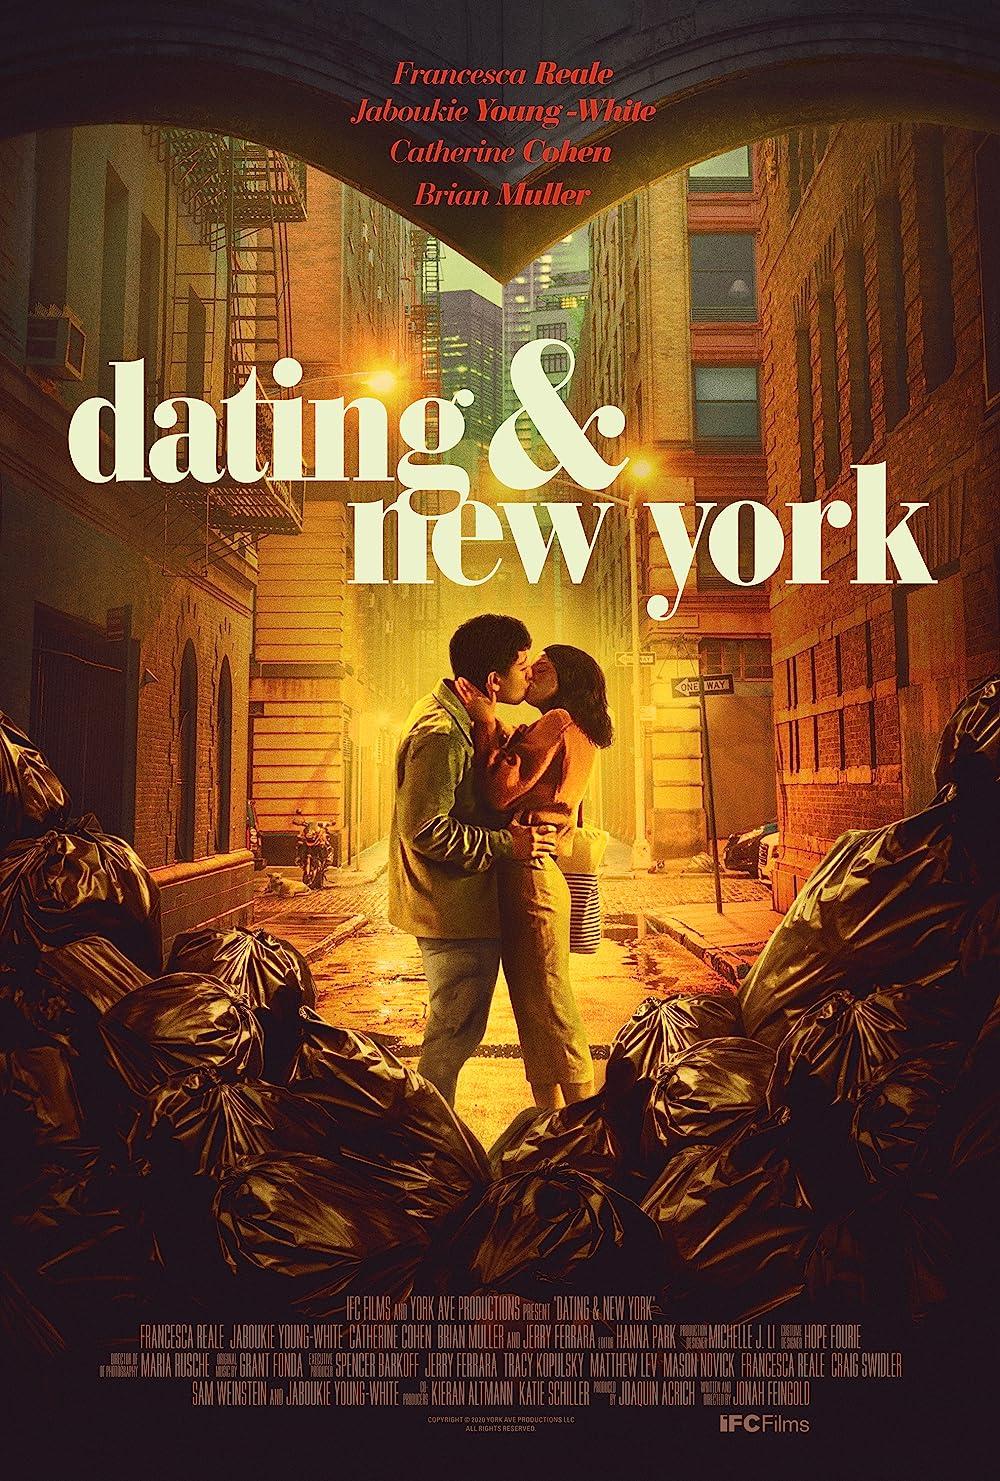 Download Dating & New York (2021) Telugu Dubbed (Voice Over) & English [Dual Audio] WebRip 720p [1XBET] FREE on 1XCinema.com & KatMovieHD.sk